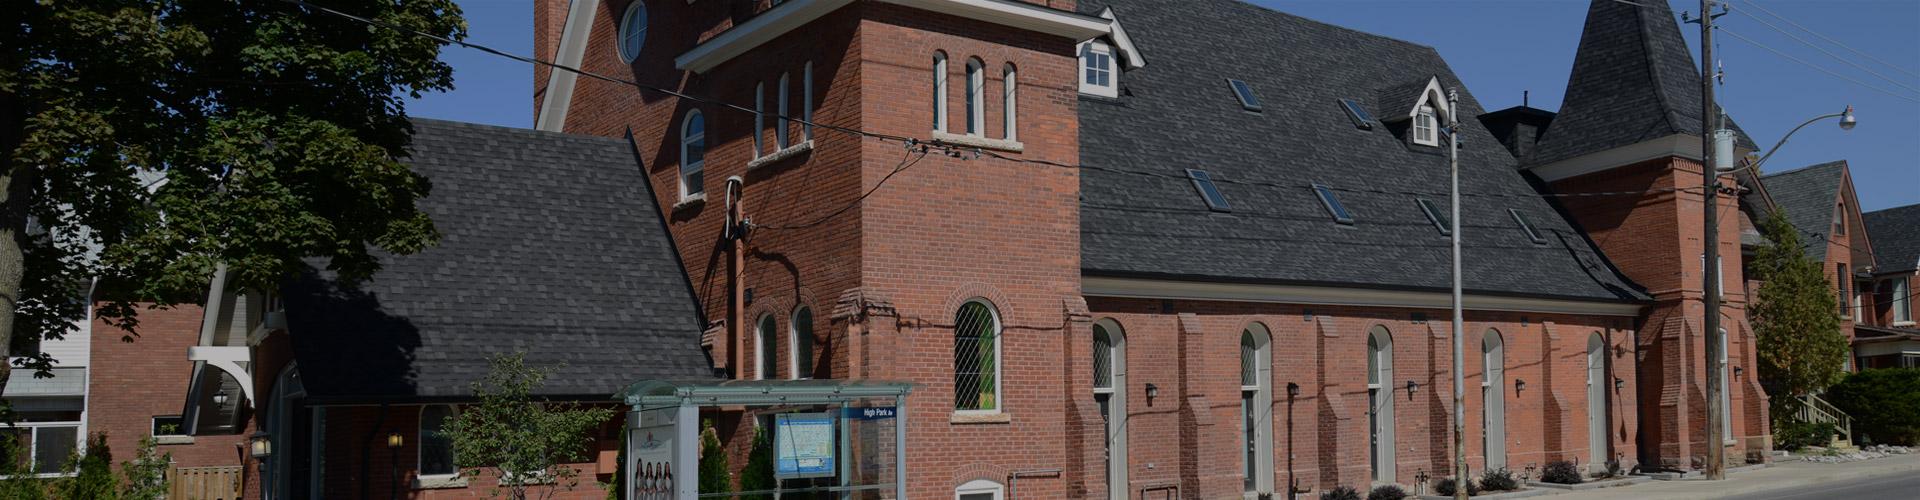 church-coversion-banner